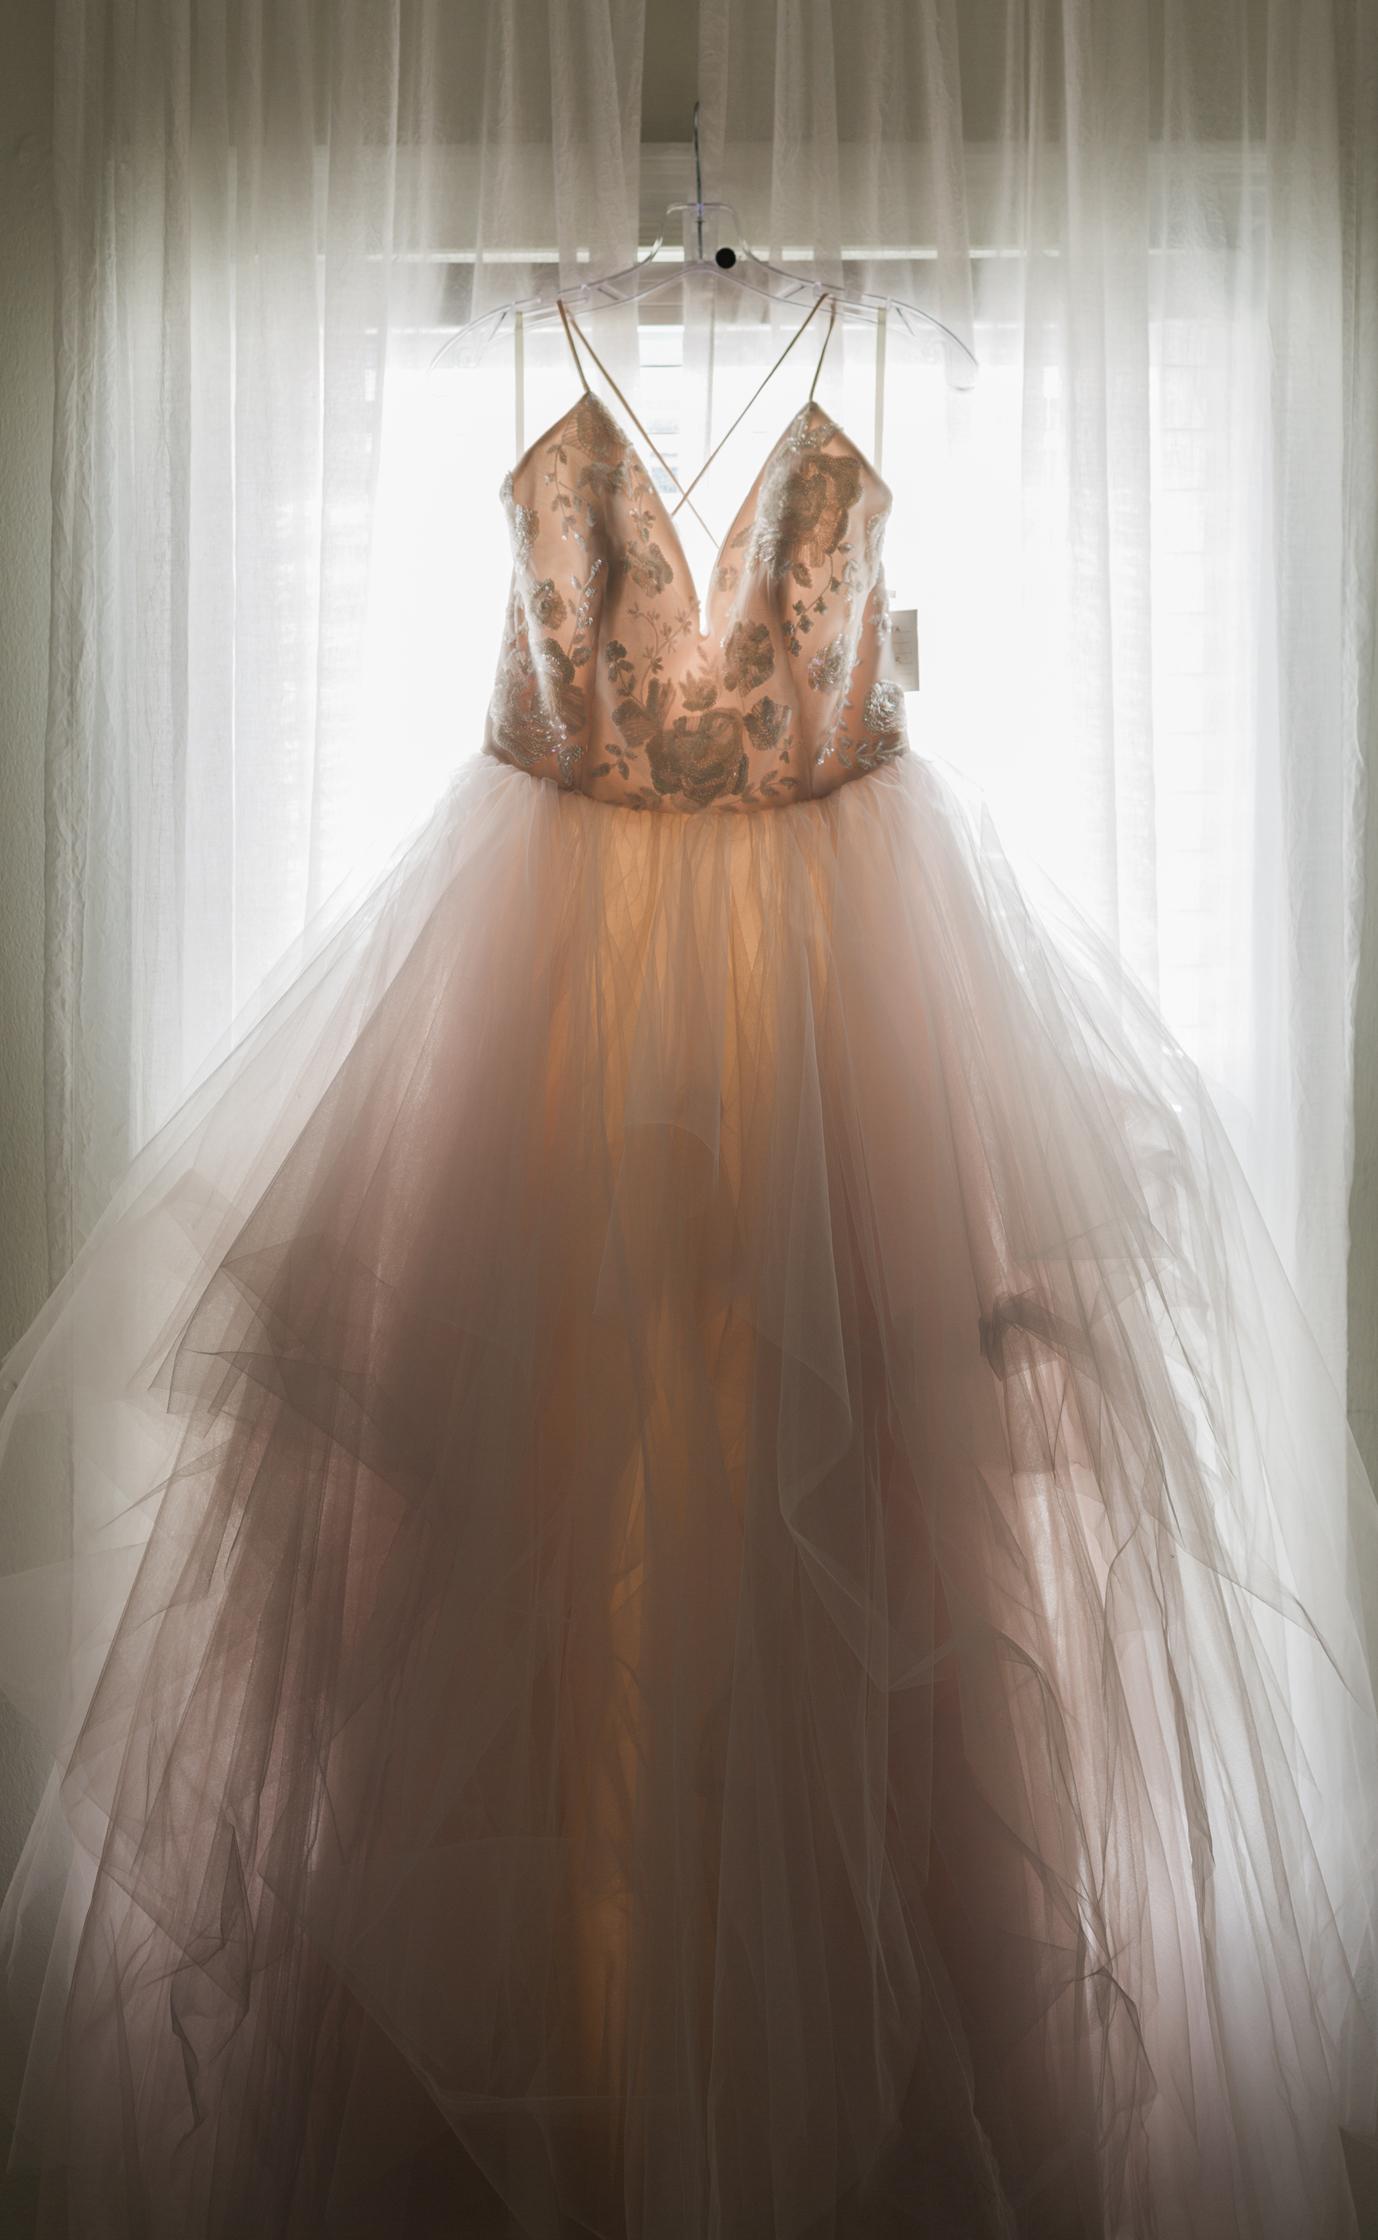 Sara + Matt + Ella _Give Back Bride_Styled Wedding Shoot _K. Stoddard Photography001.jpg